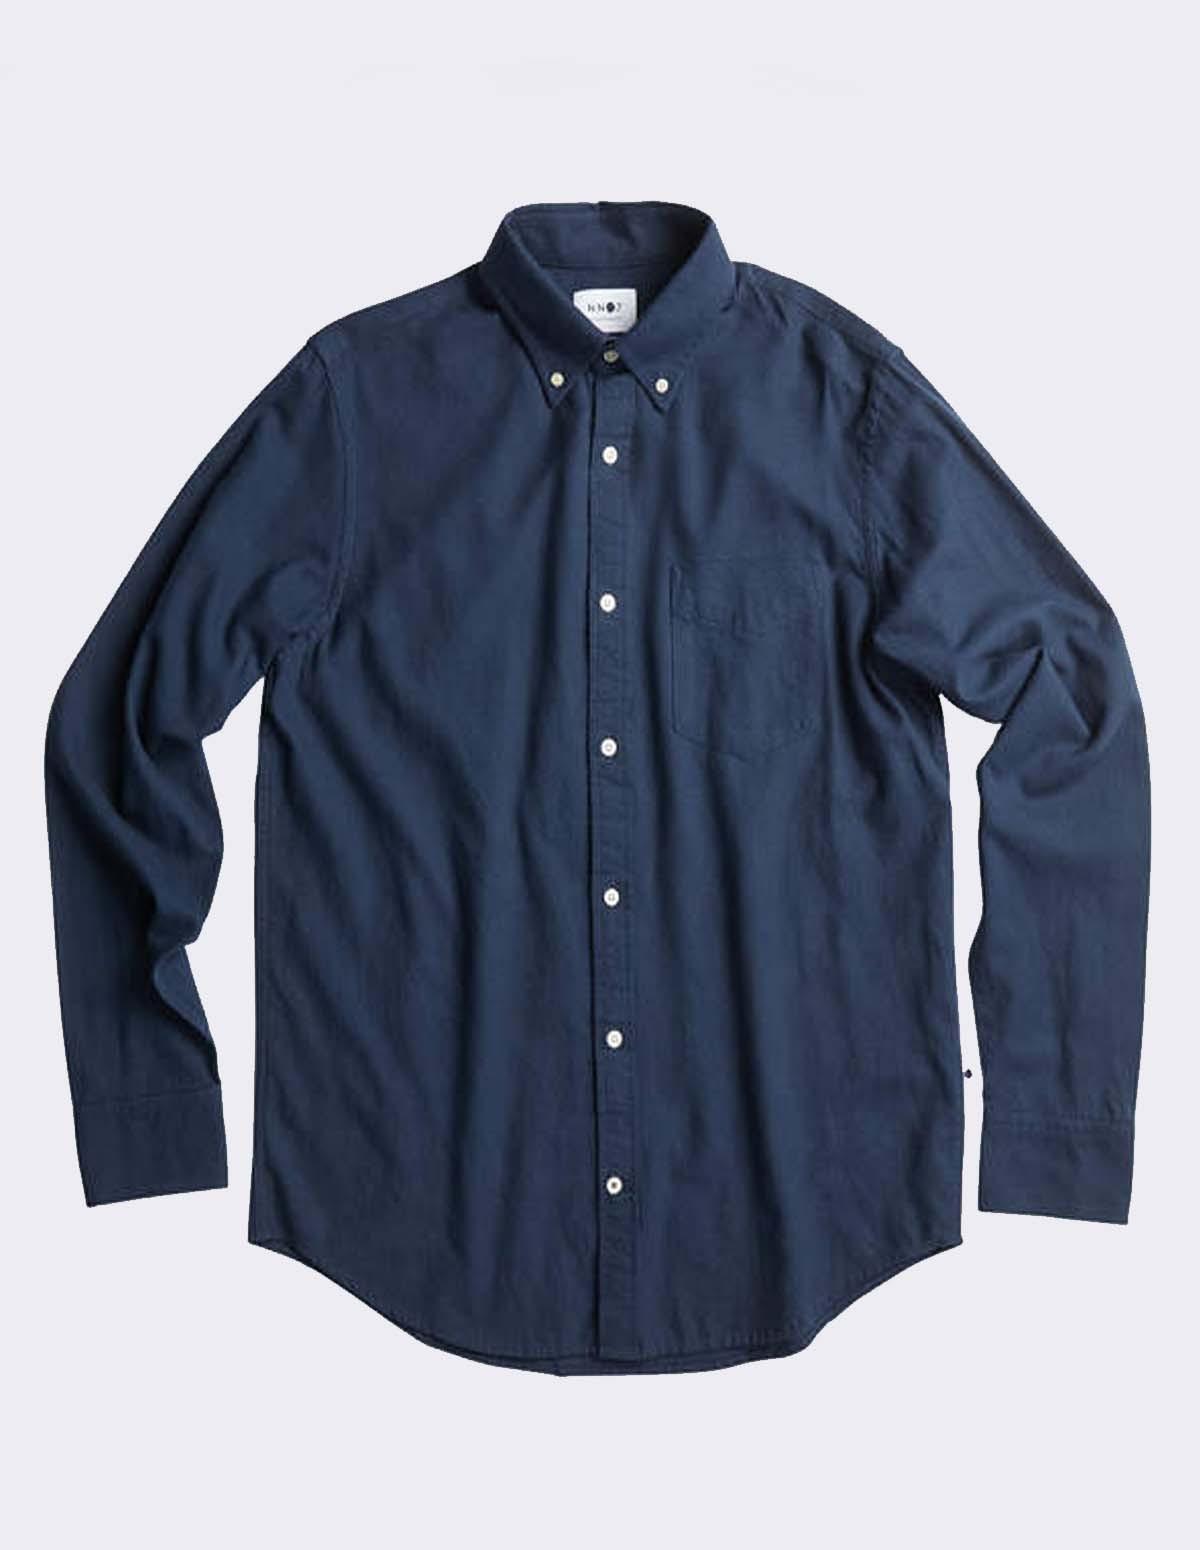 Nn07 Levon Shirt 5159 - 200 NAVY